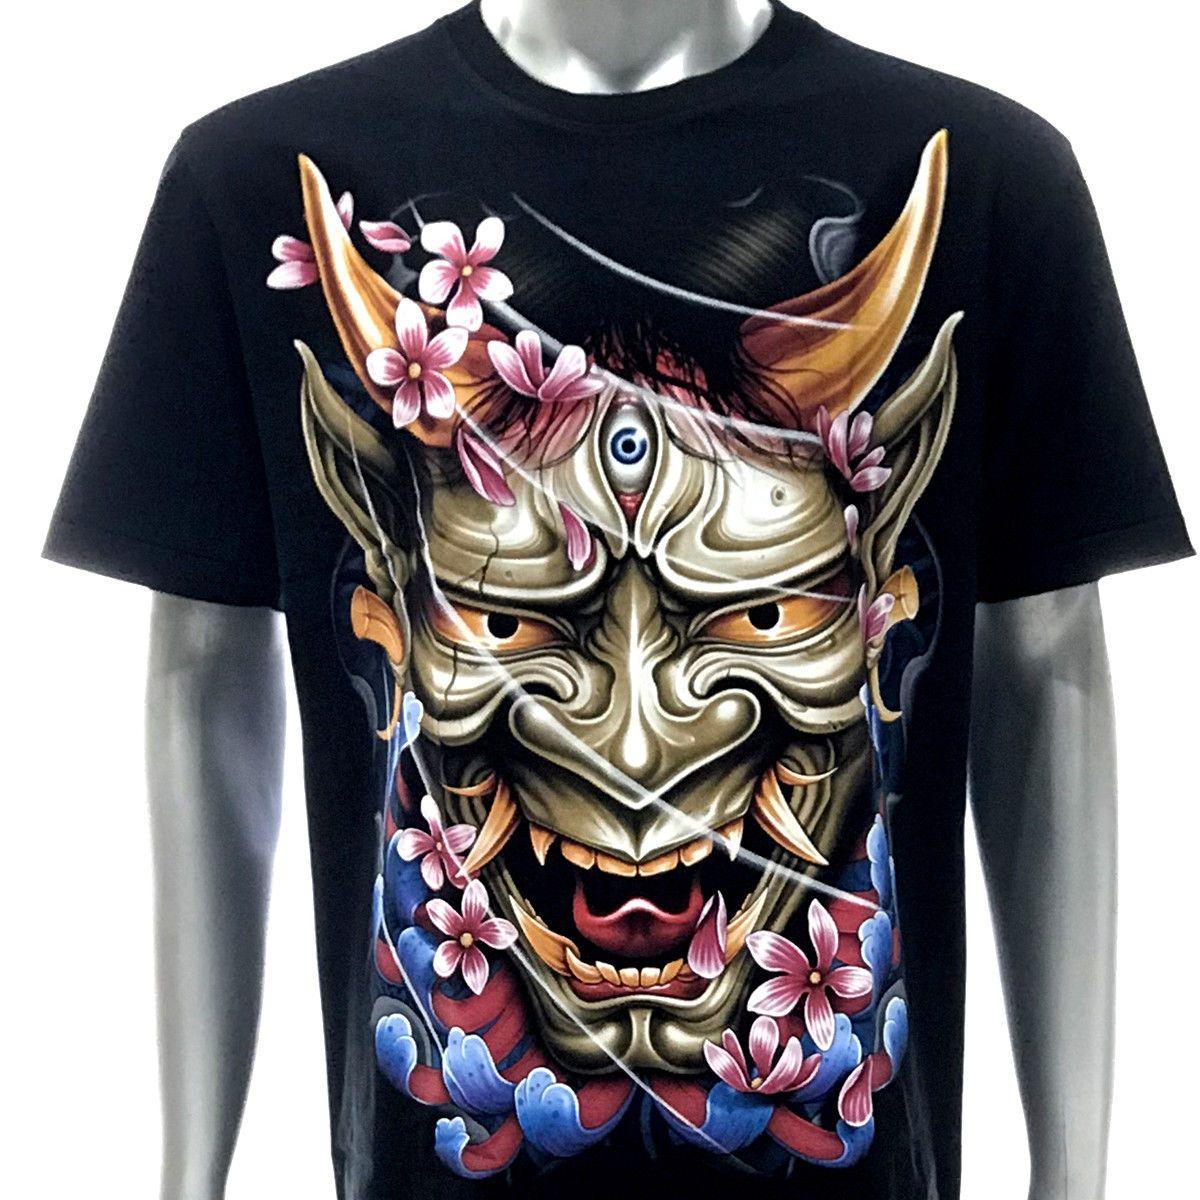 0eb5f53462d2b r230 Rock Eagle T-shirt Tattoo GLOW in DARK Japanese Demon Sakura Hannya  Mask Men Women Unisex Fashion tshirt Free Shipping black